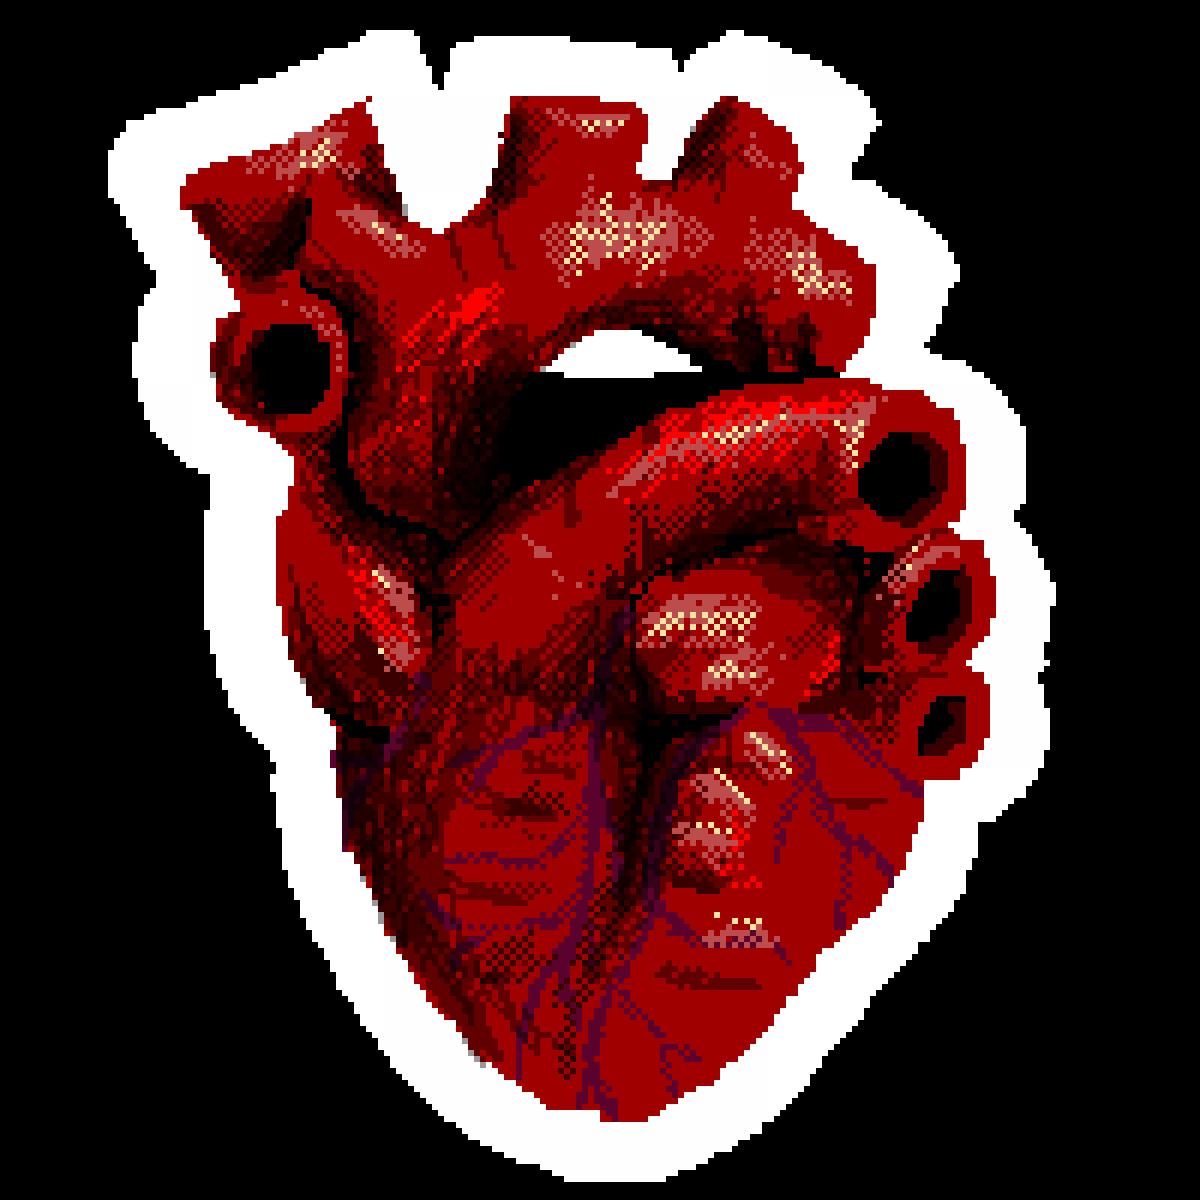 heart by Imnoen